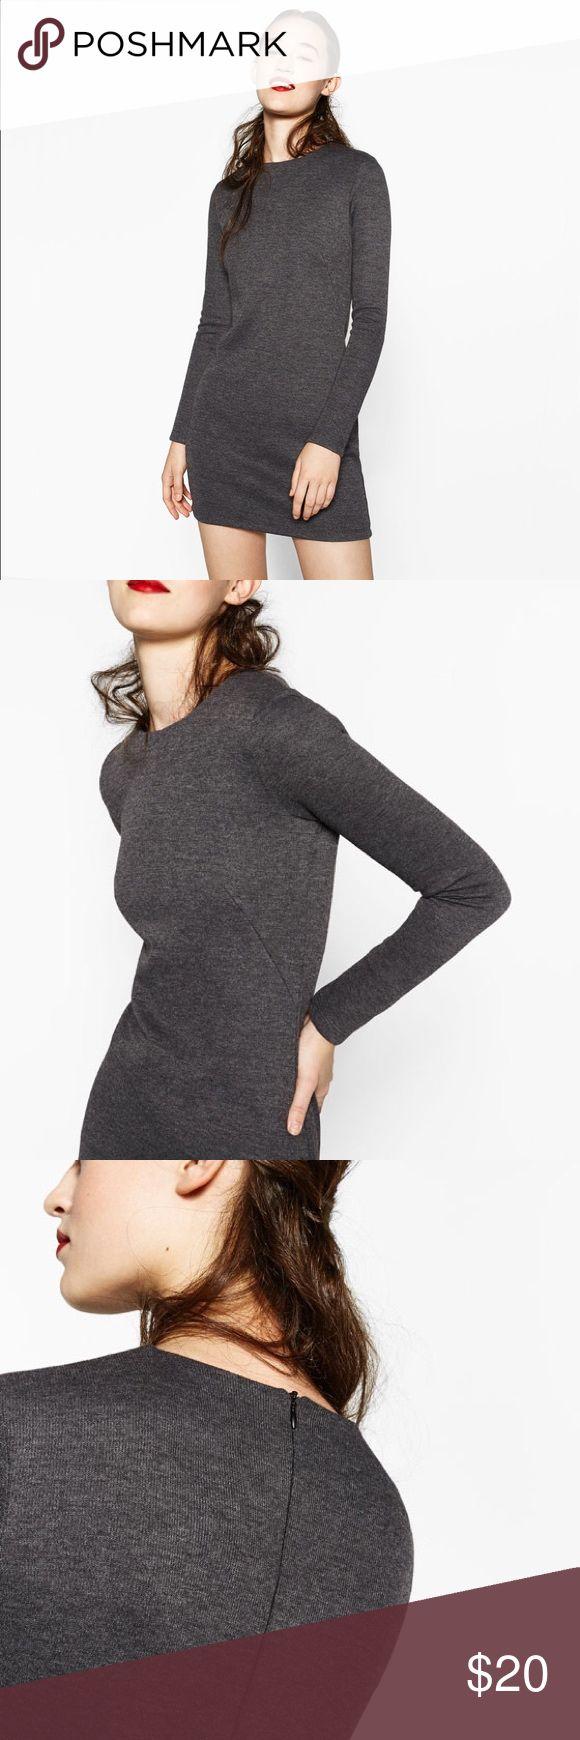 NWOT Zara grey long sleeve dress NWOT Zara grey sleeve dress Zara Dresses Mini